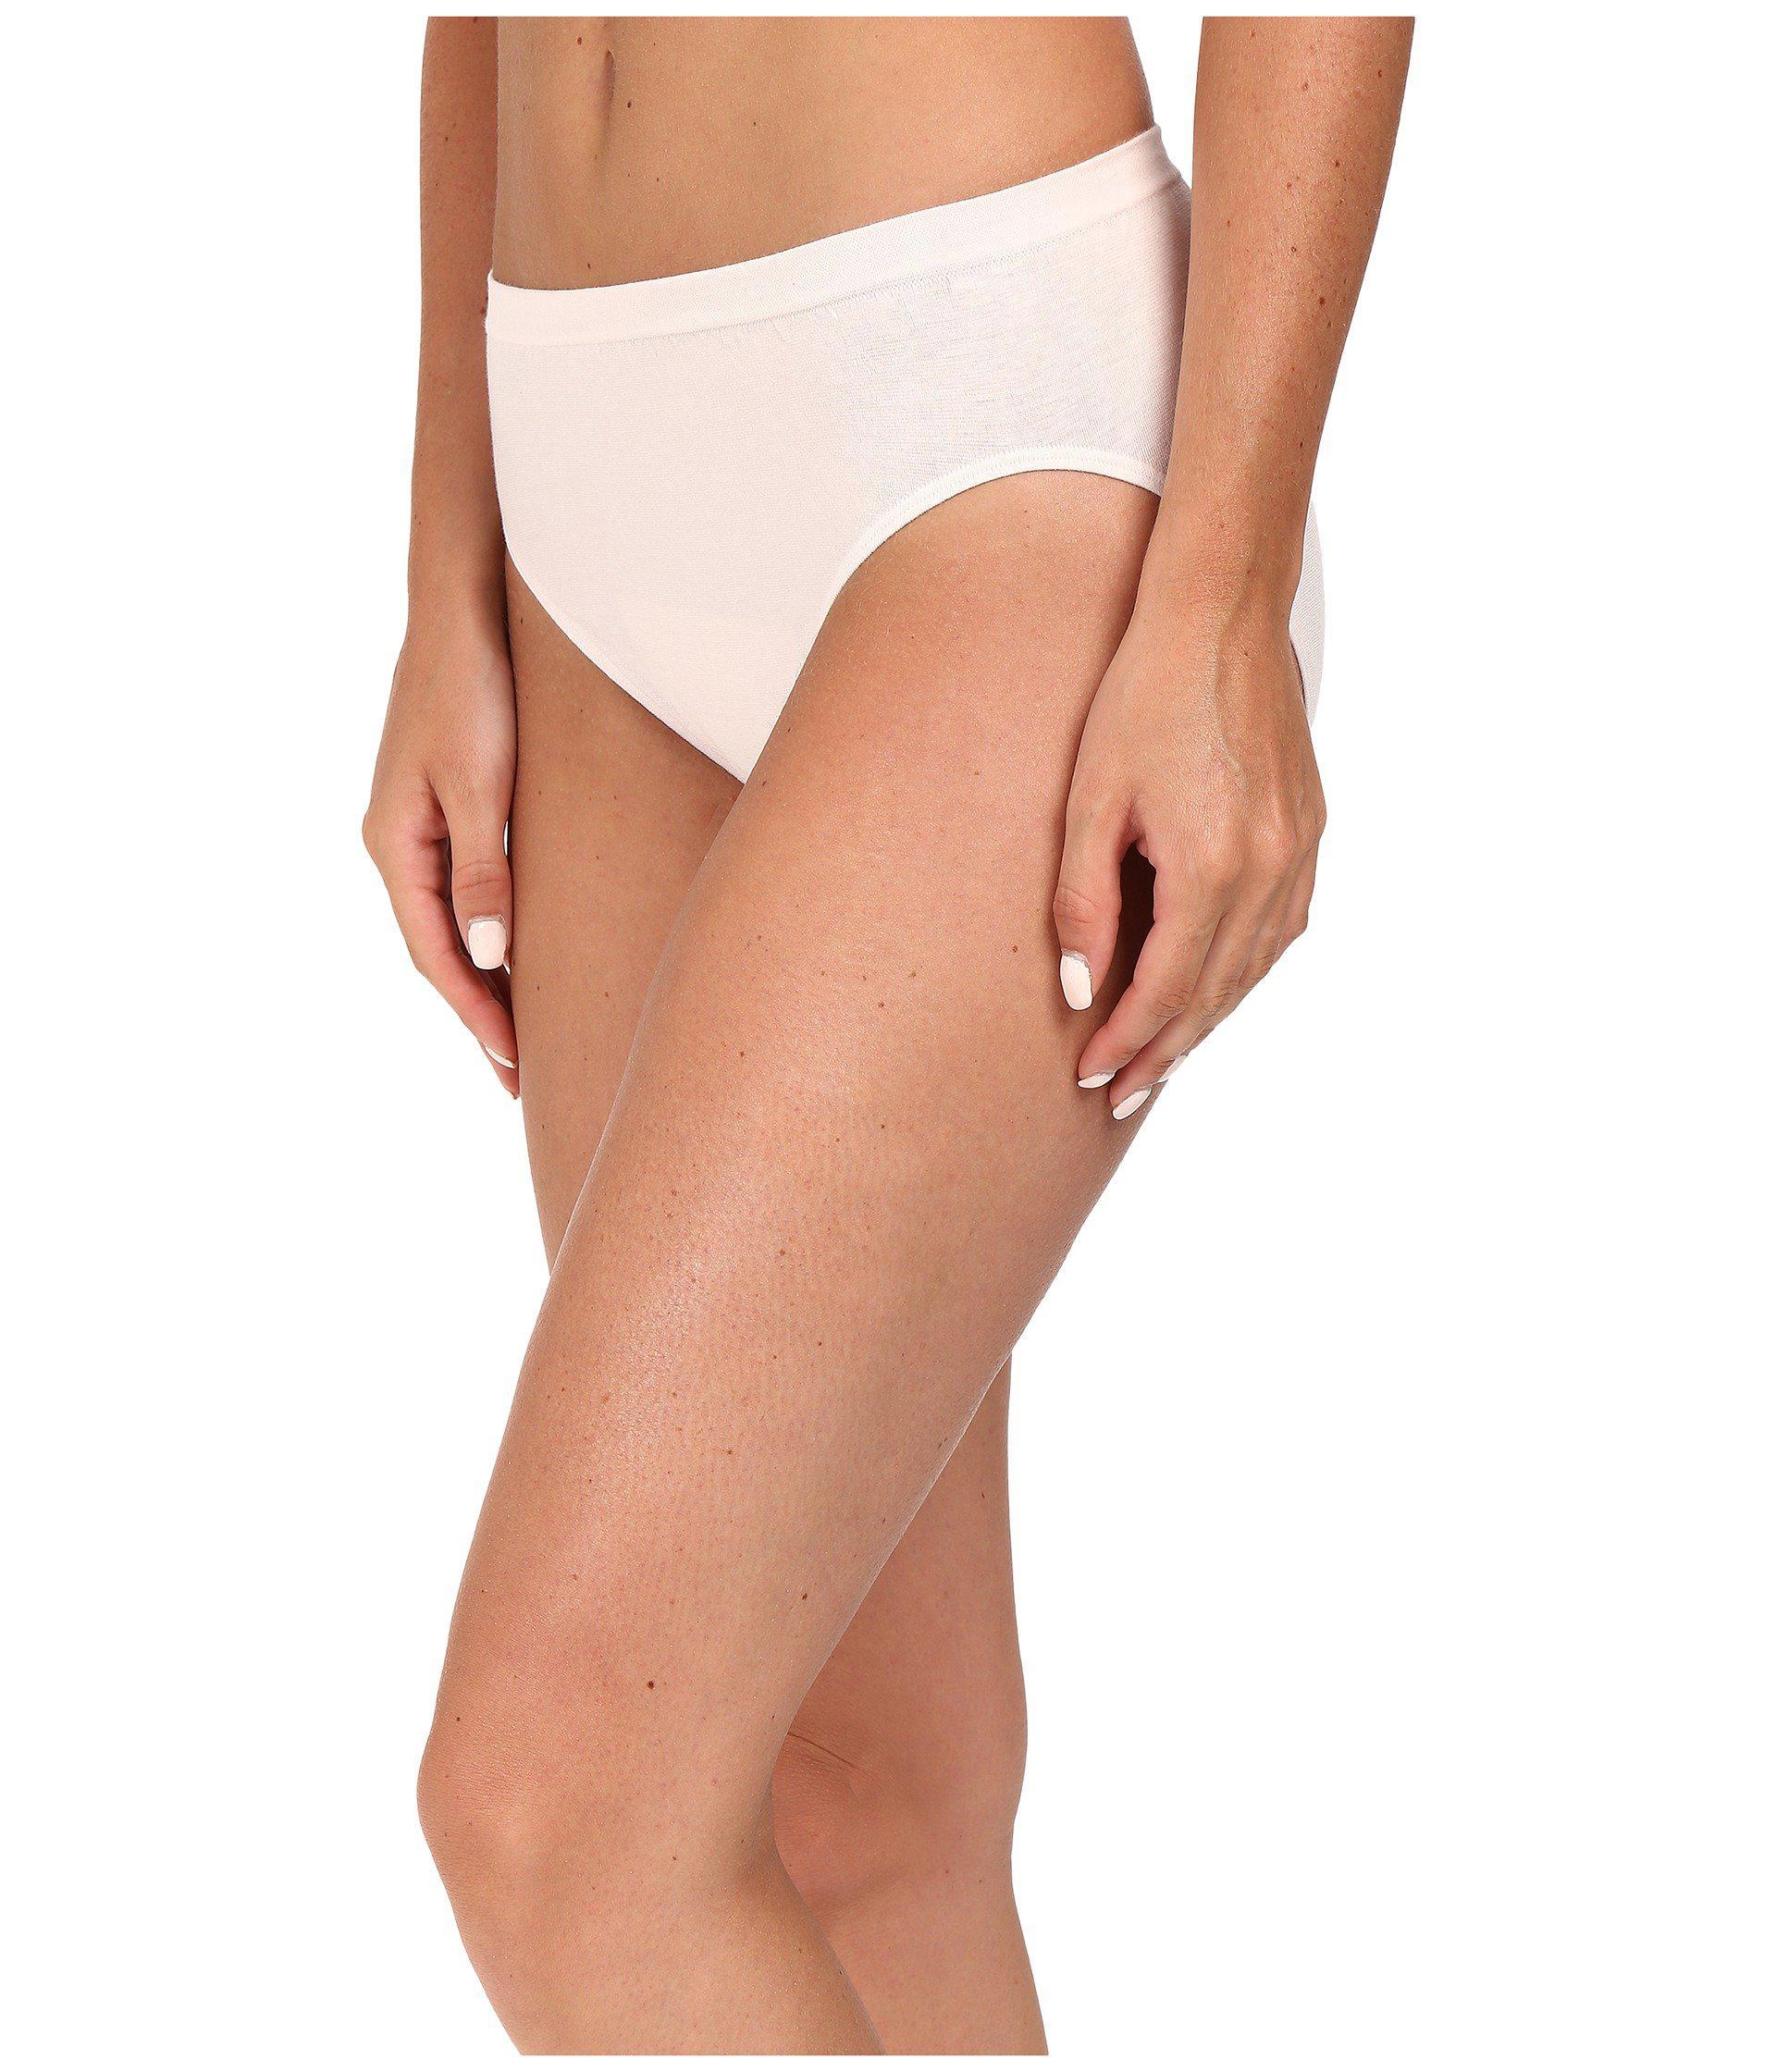 0c8a787c9bc7c Lyst - Jockey Comfies(r) Cotton French Cut 3-pack (white shell White)  Women s Underwear